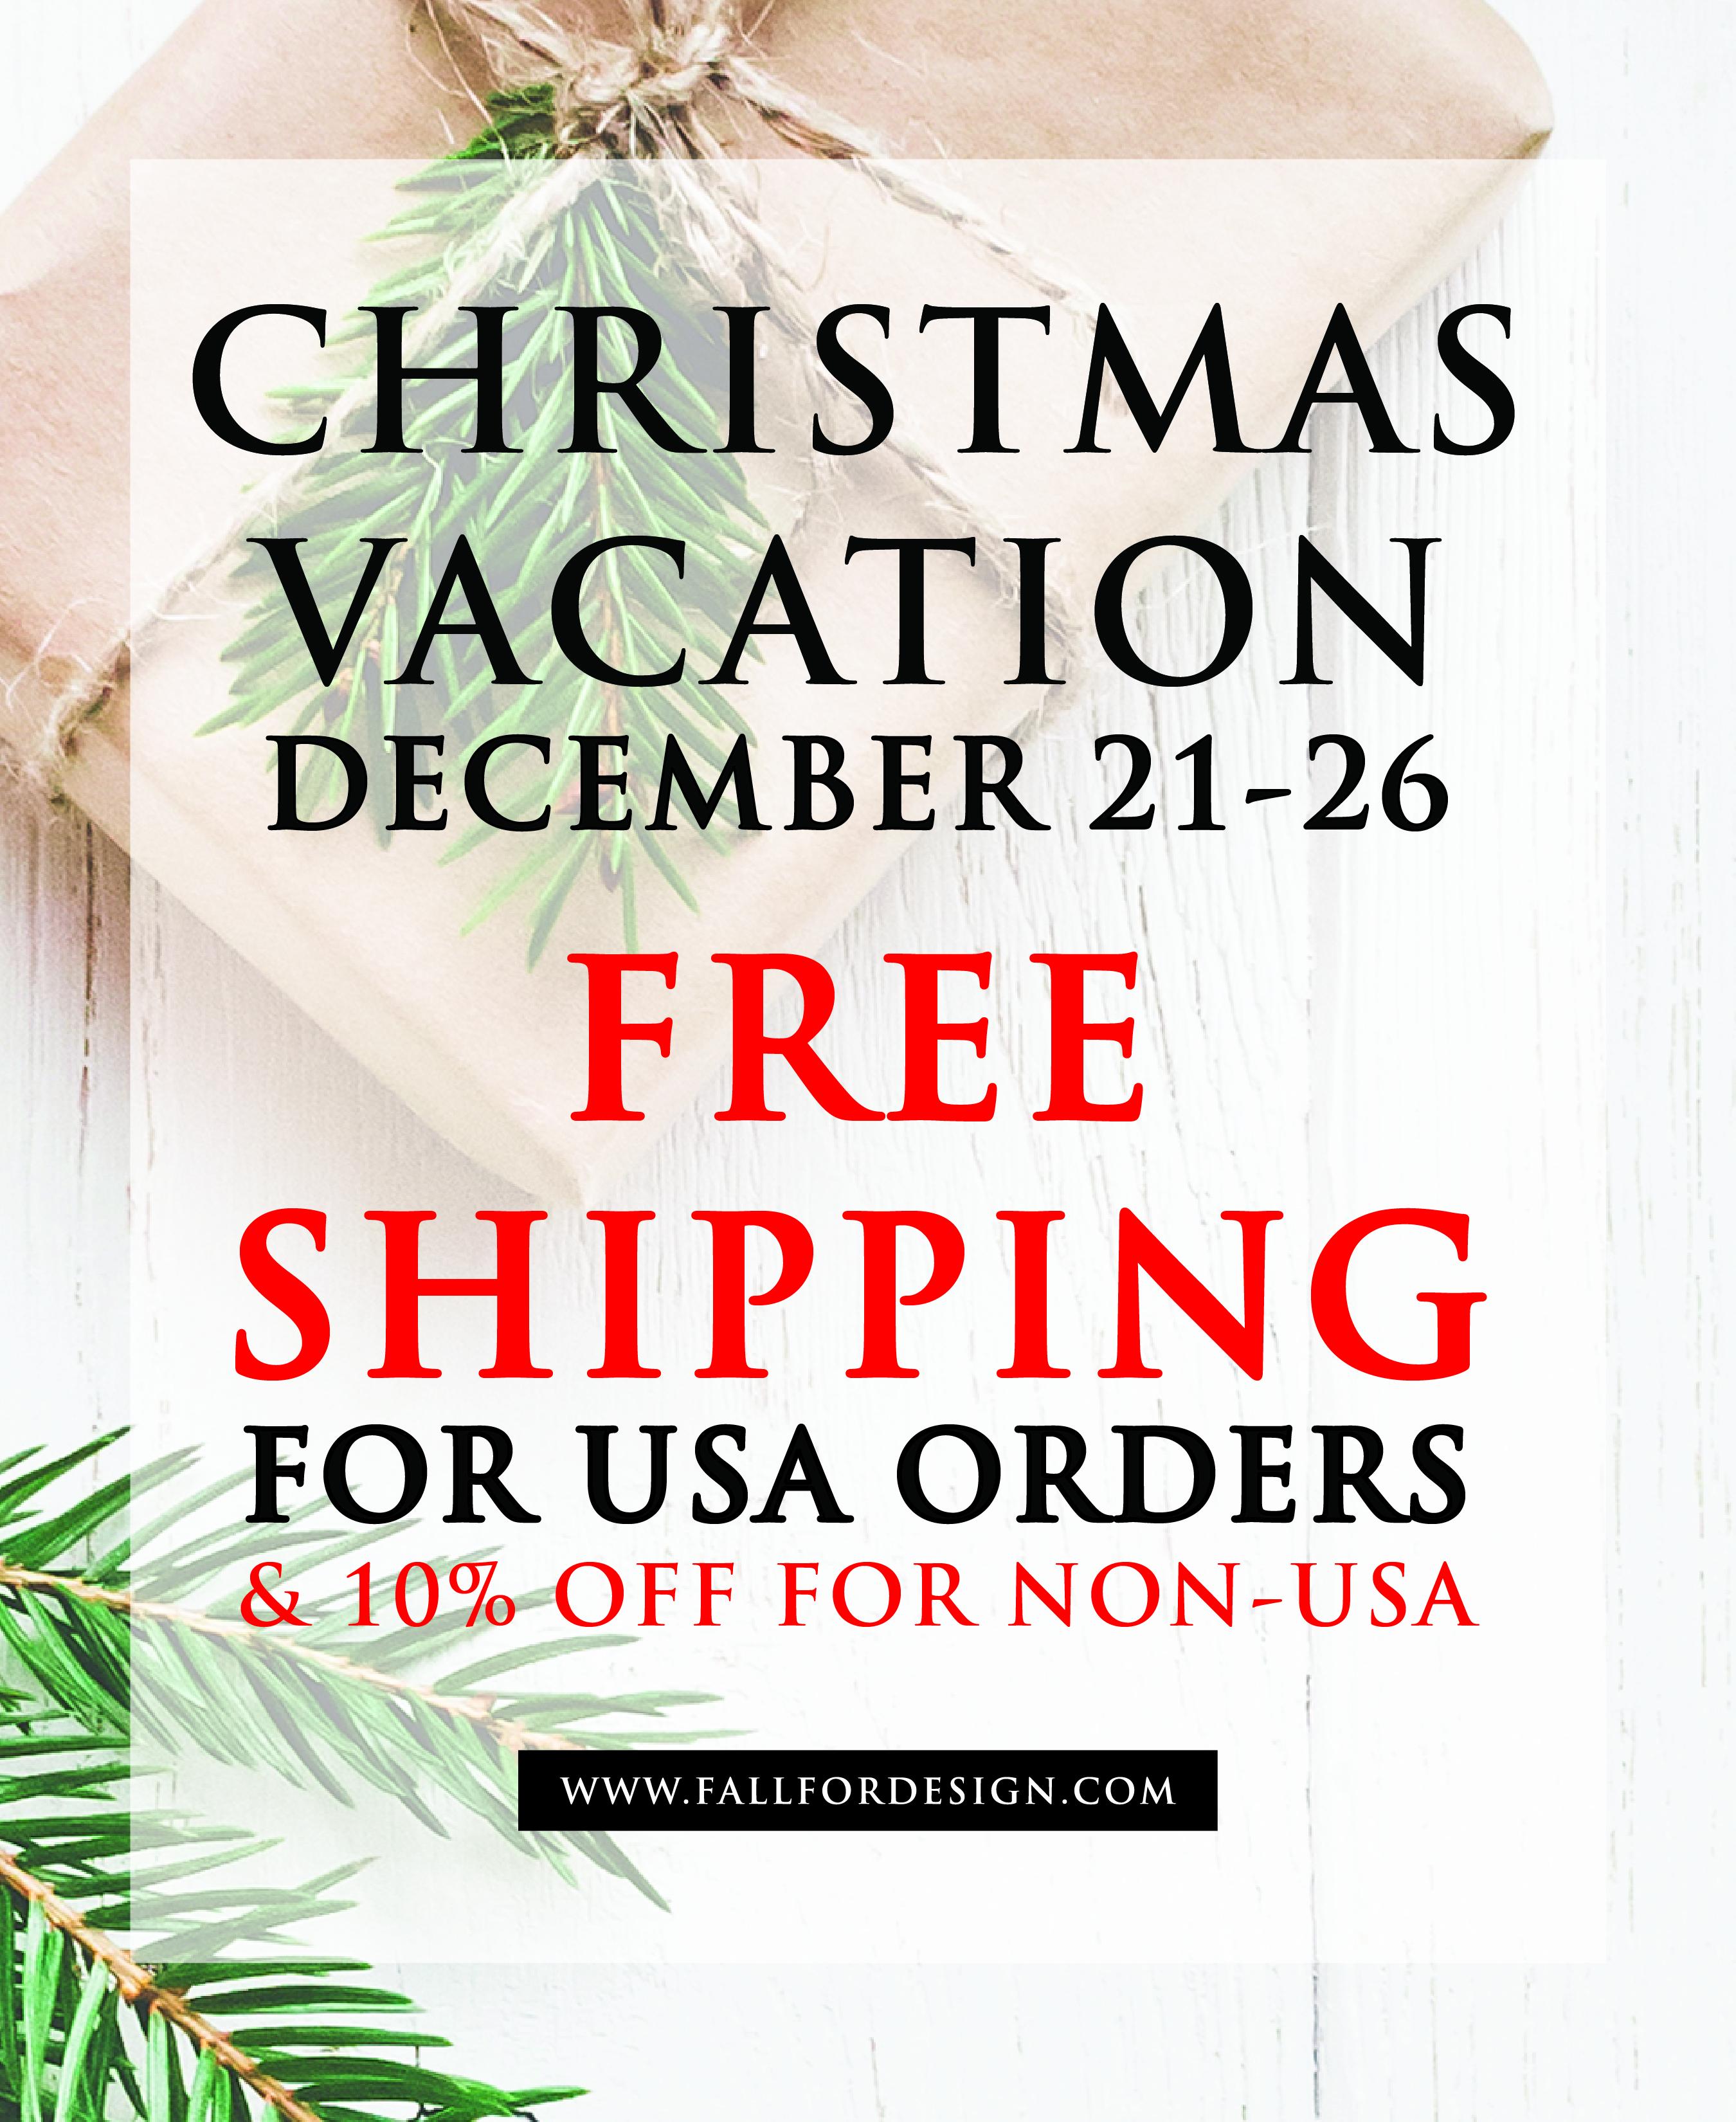 Christmas Vacation Shop Sale!